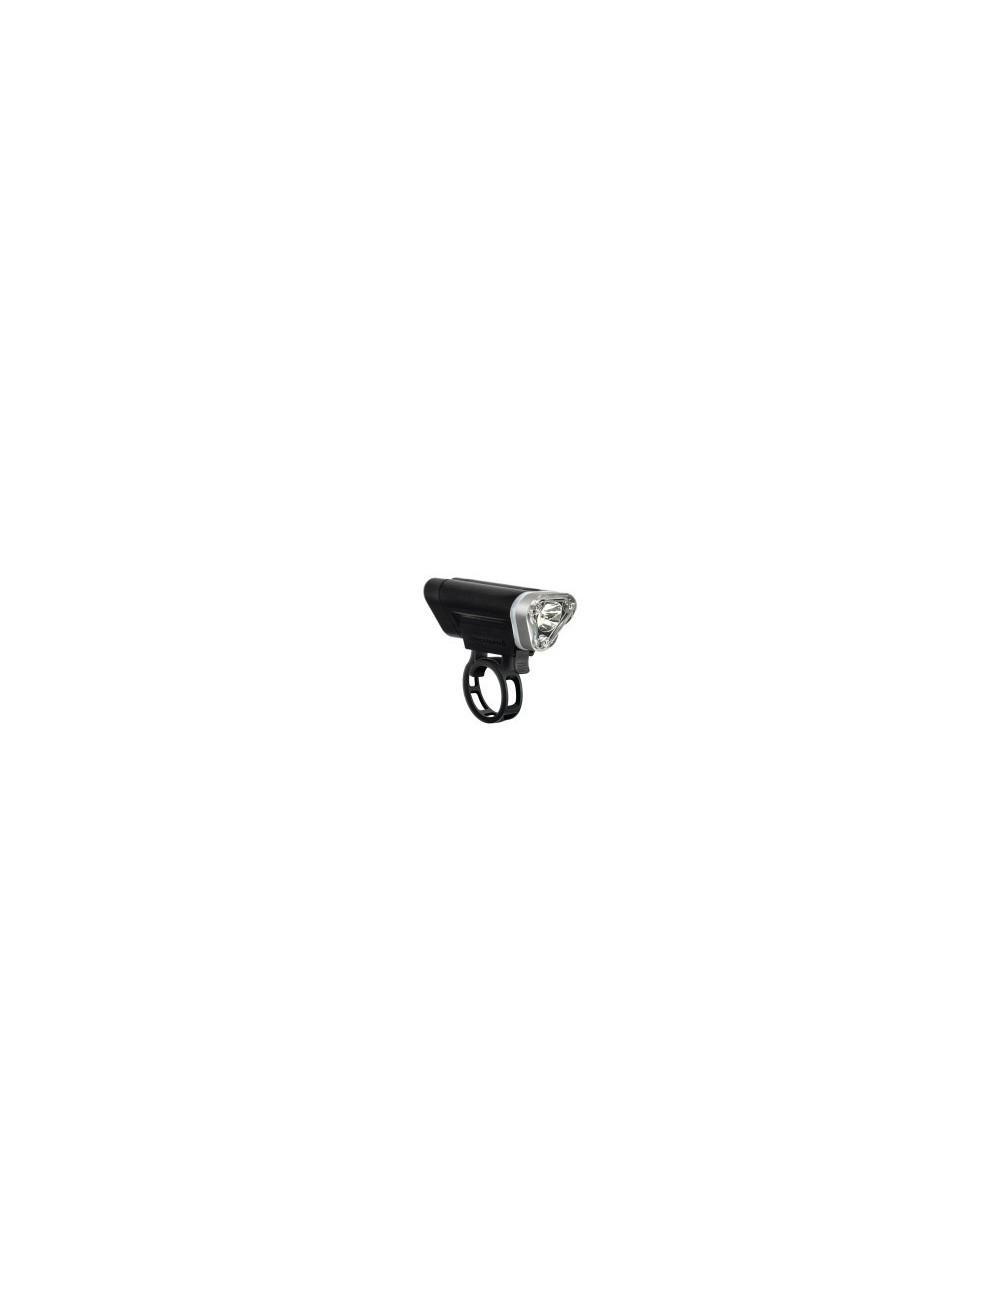 LUZ BLACKBURN LOCAL 75 FRENTE -2019